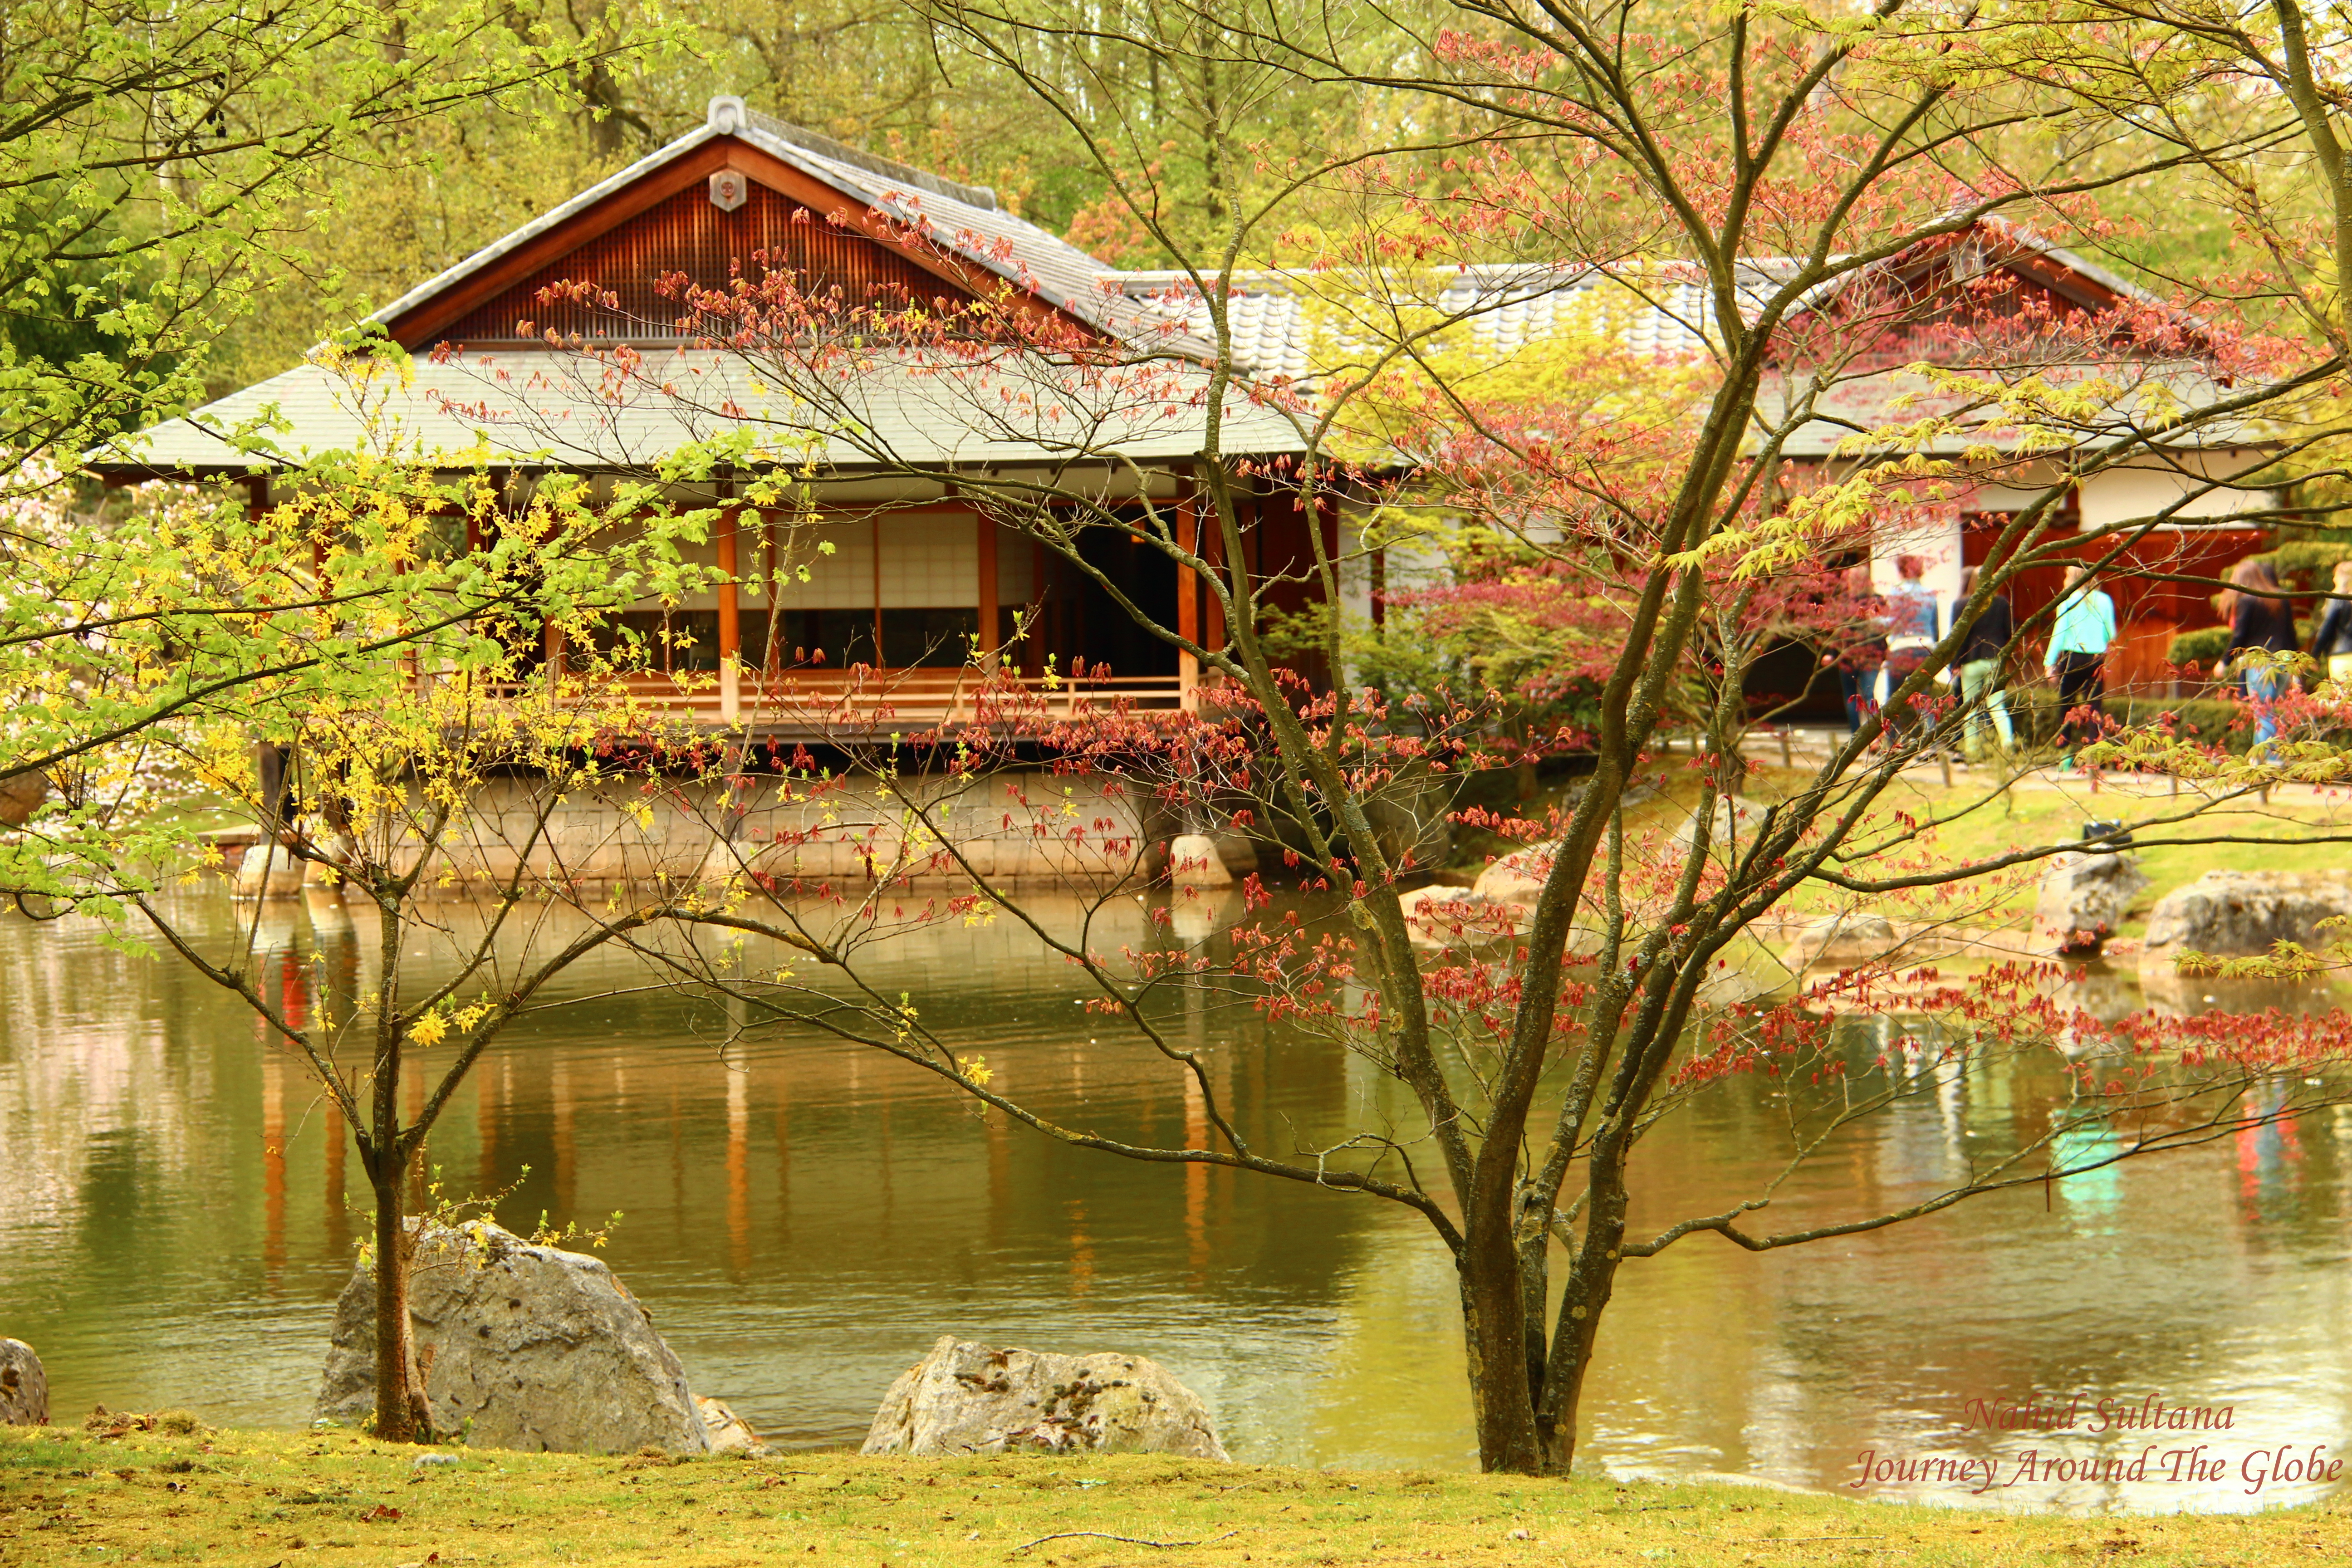 Hasselt Japanese Garden in Hasselt, Belgium | Journey Around The Globe